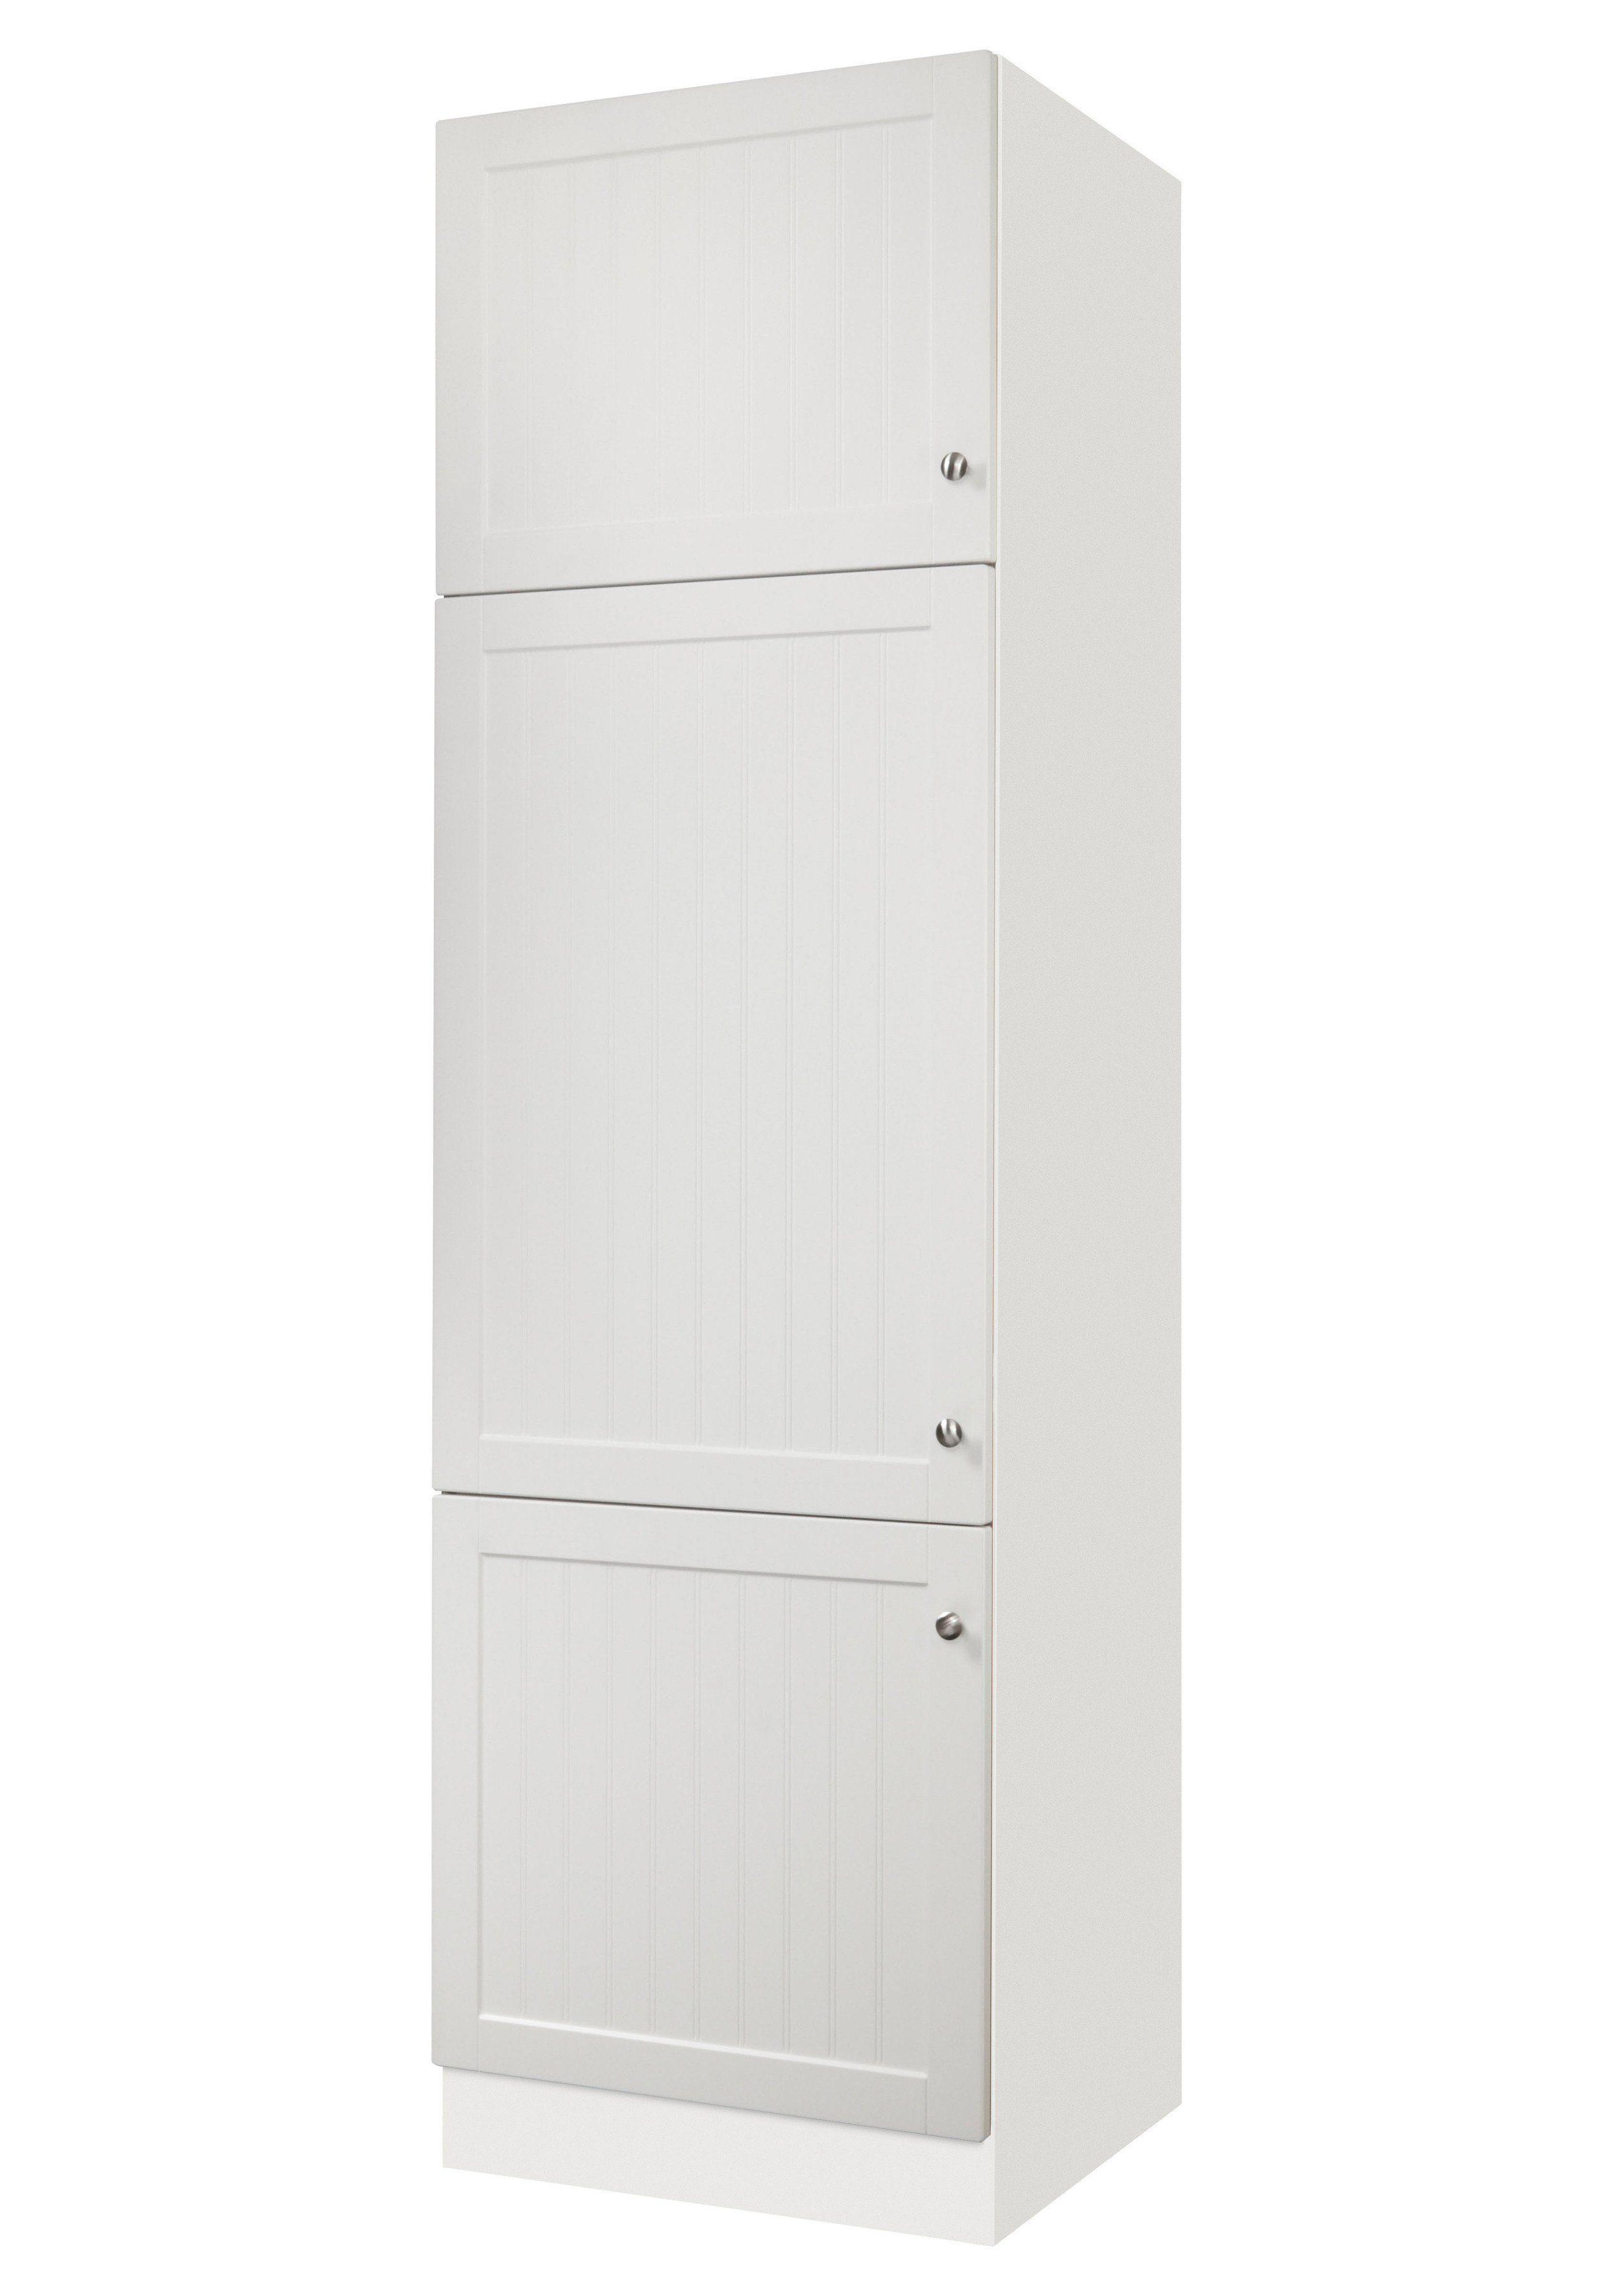 Optifit Kühlumbauschrank »Bornholm«, Höhe 206,8 cm